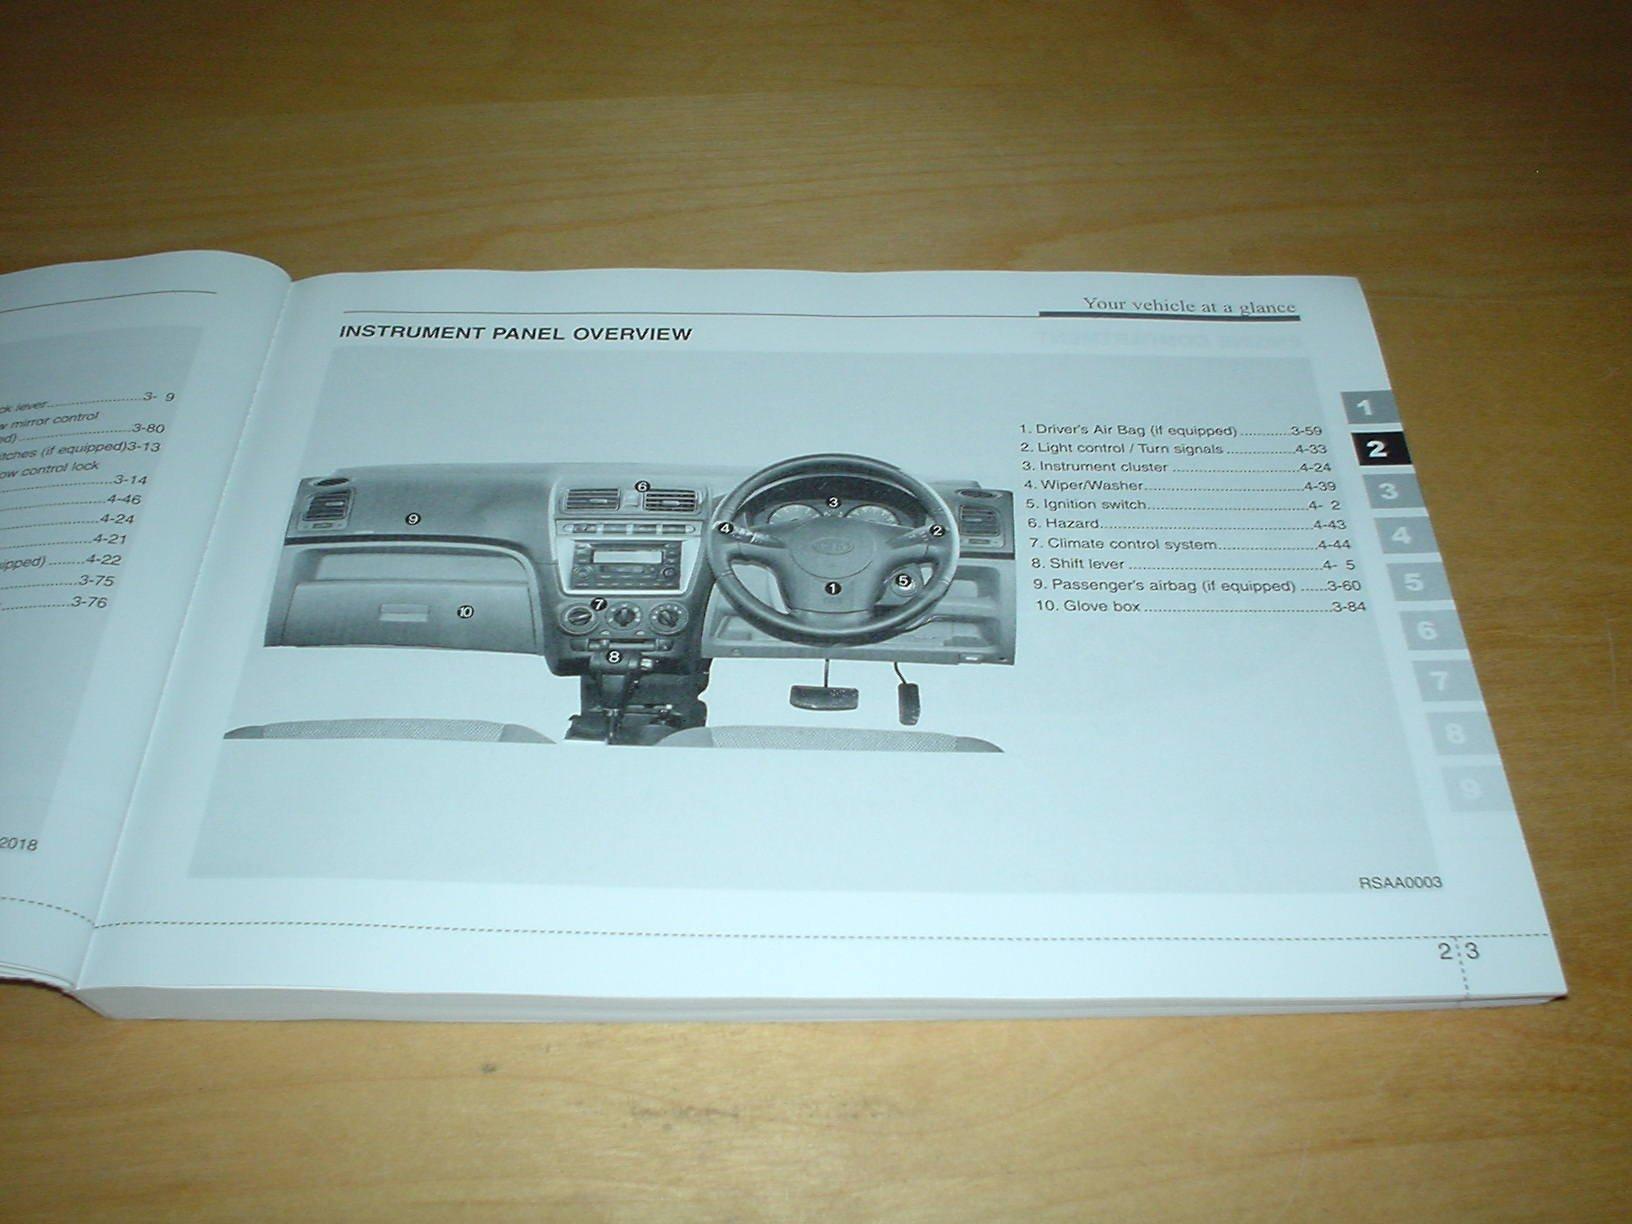 Kia Picanto Handbook - All About Kia